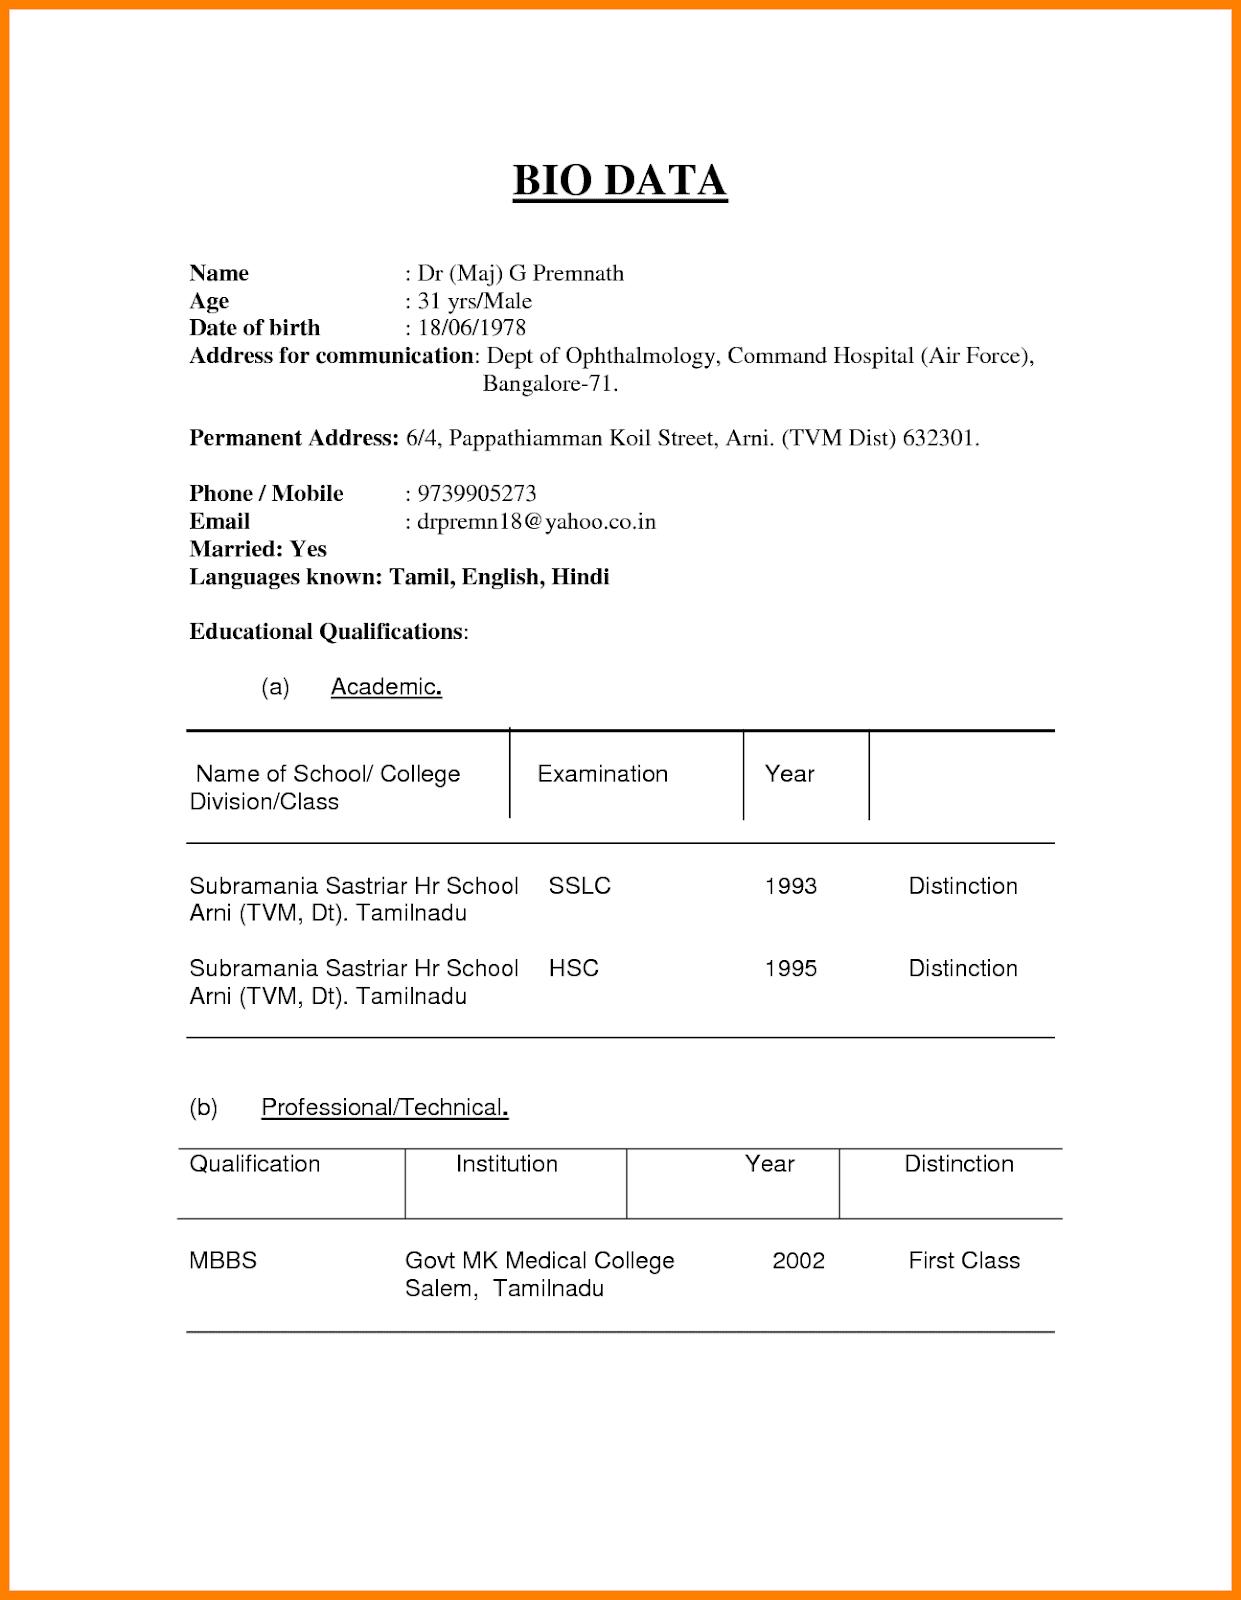 marriage biodata template doc marriage biodata format doc marriage cv format doc marriage cv format doc download marriage biodata format doc free download marriage biodata format docx marriage biodata format doc download